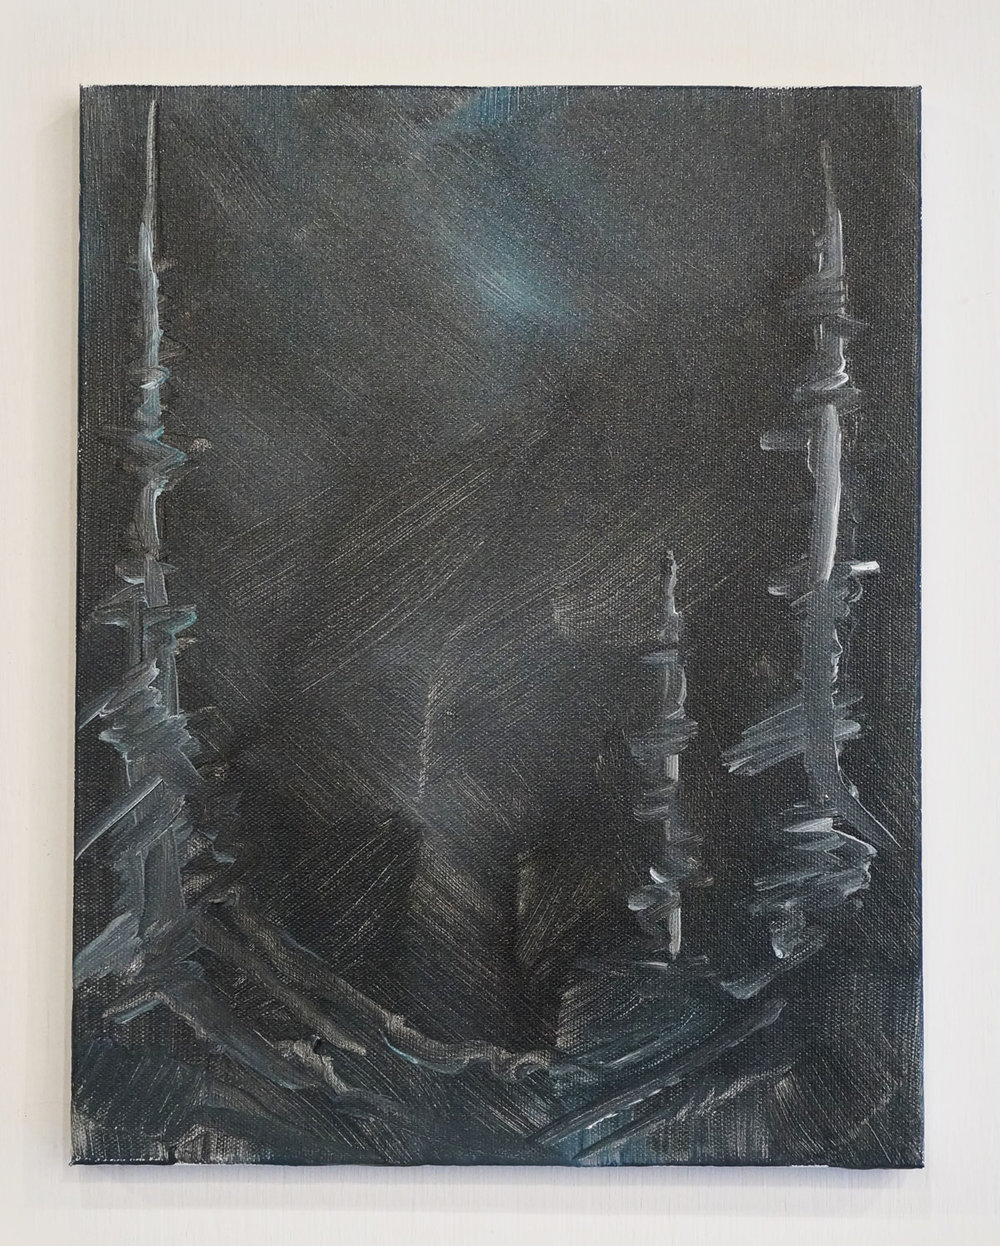 Tomorrow in a Year, 2017, acrylic on canvas, 14 x 11in